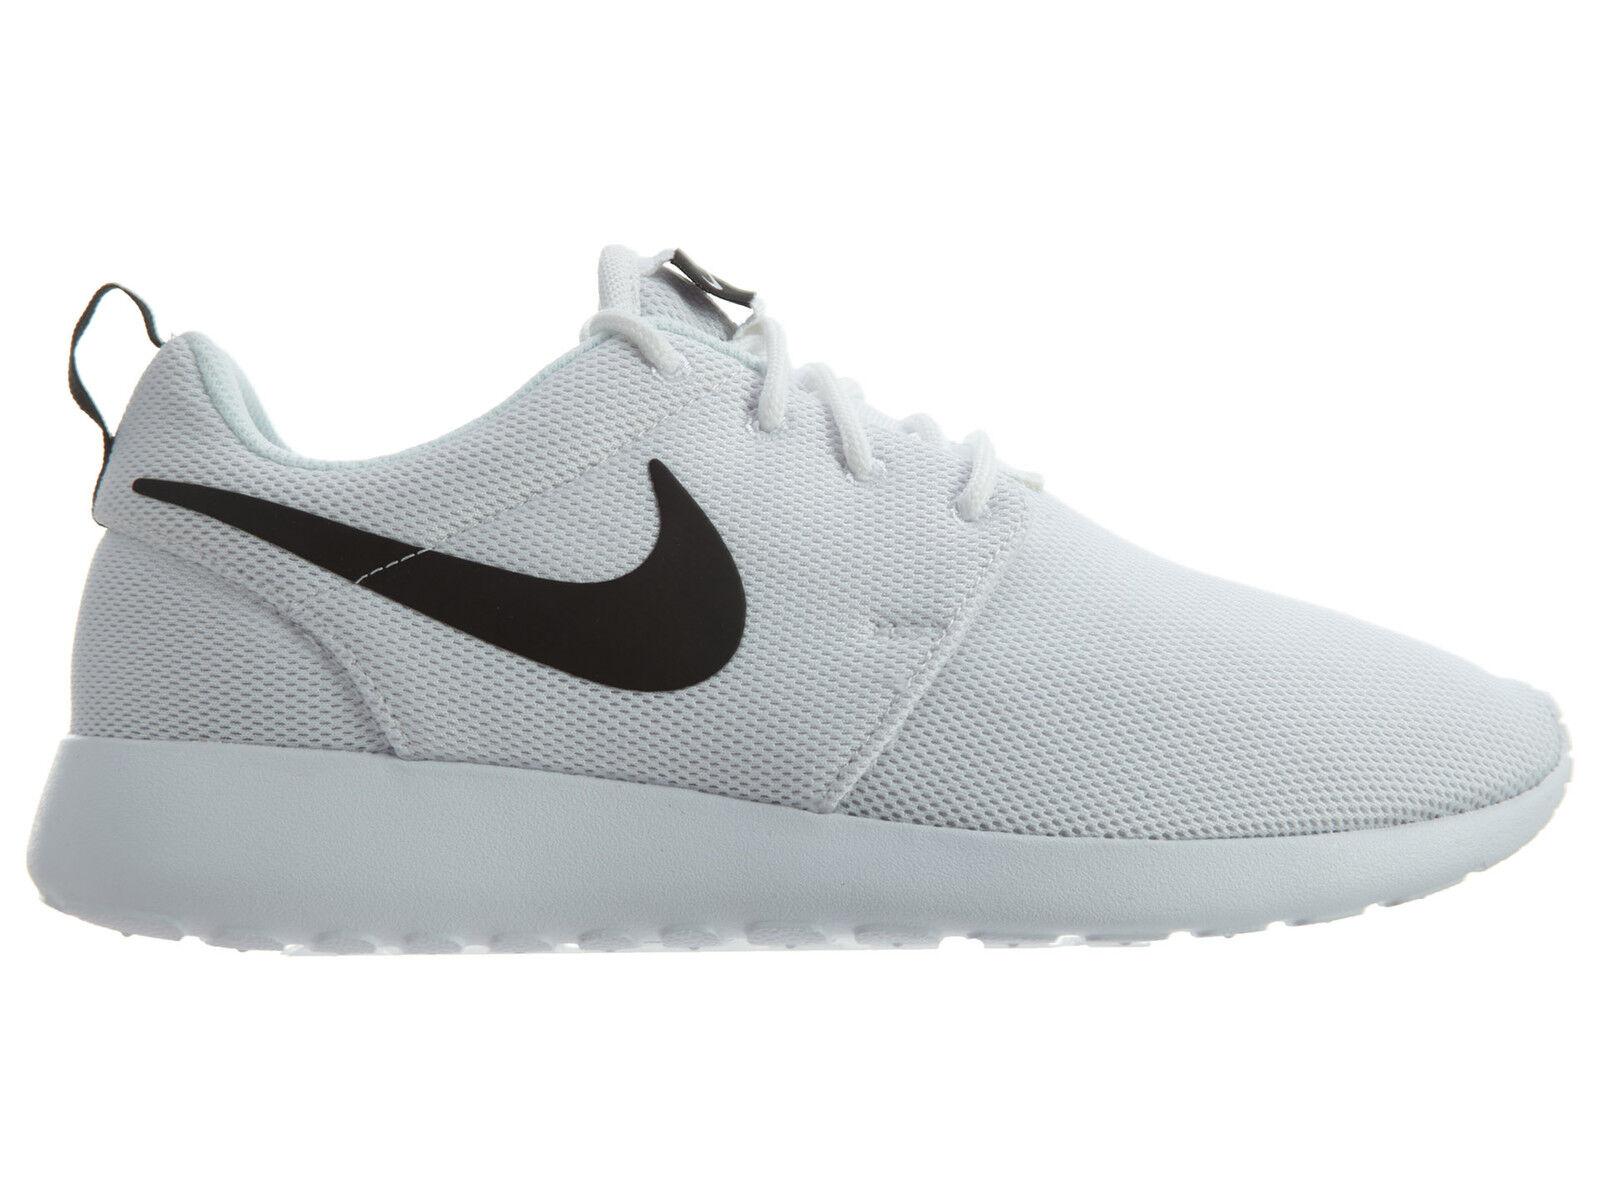 Nike Roshe One Womens 844994-101 White Black Mesh Running Shoes Wmns Size 7